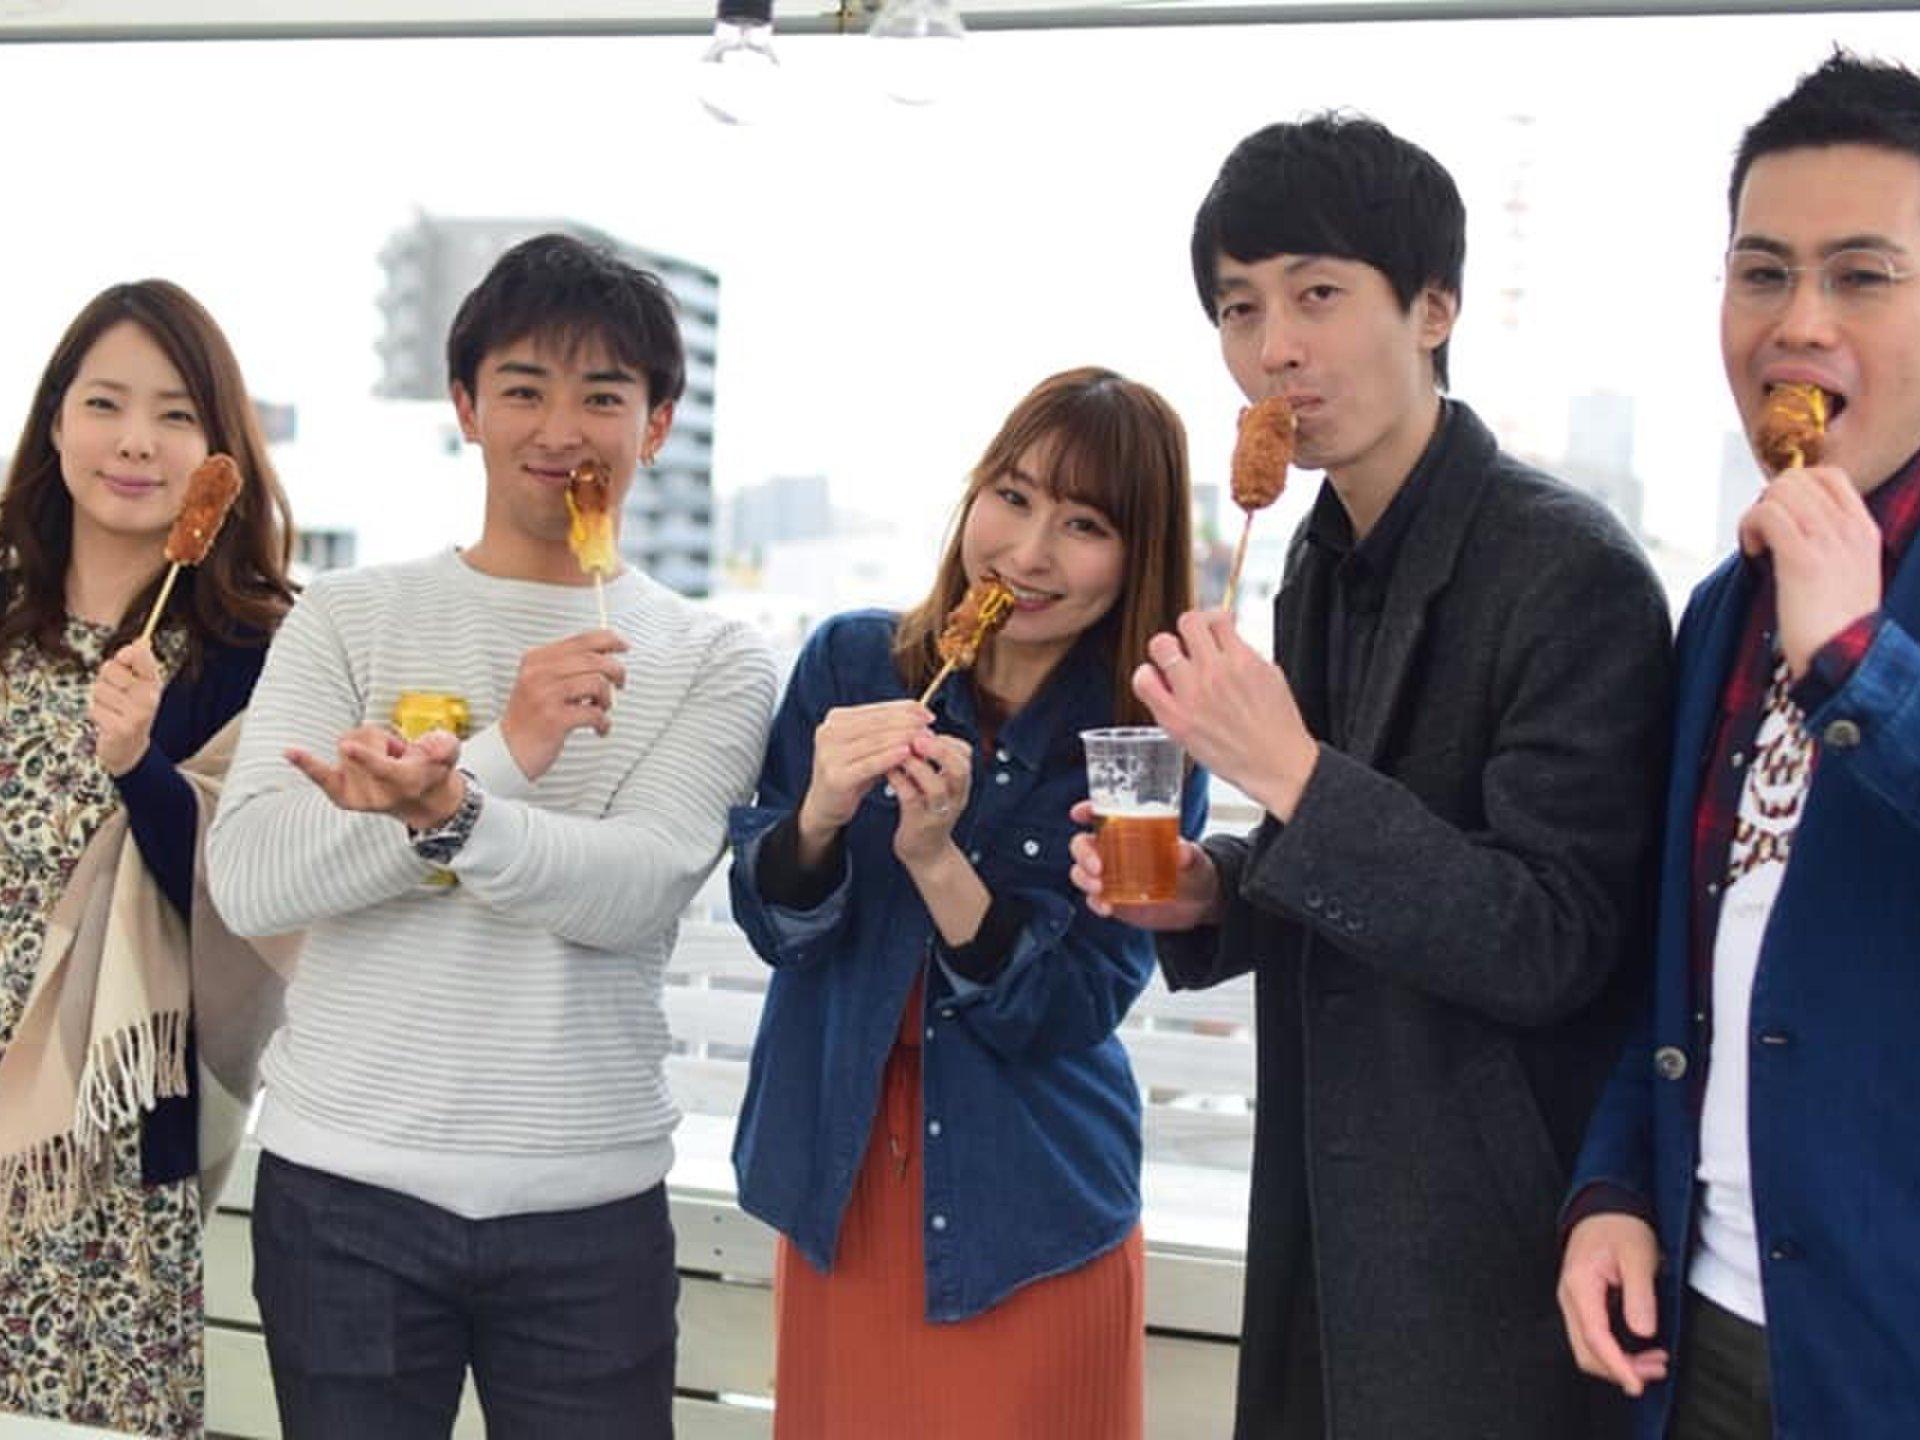 GW初日は、「遊部(アソブ)」でソーセージ作りBBQ♡気になるイベントに参加してみた!